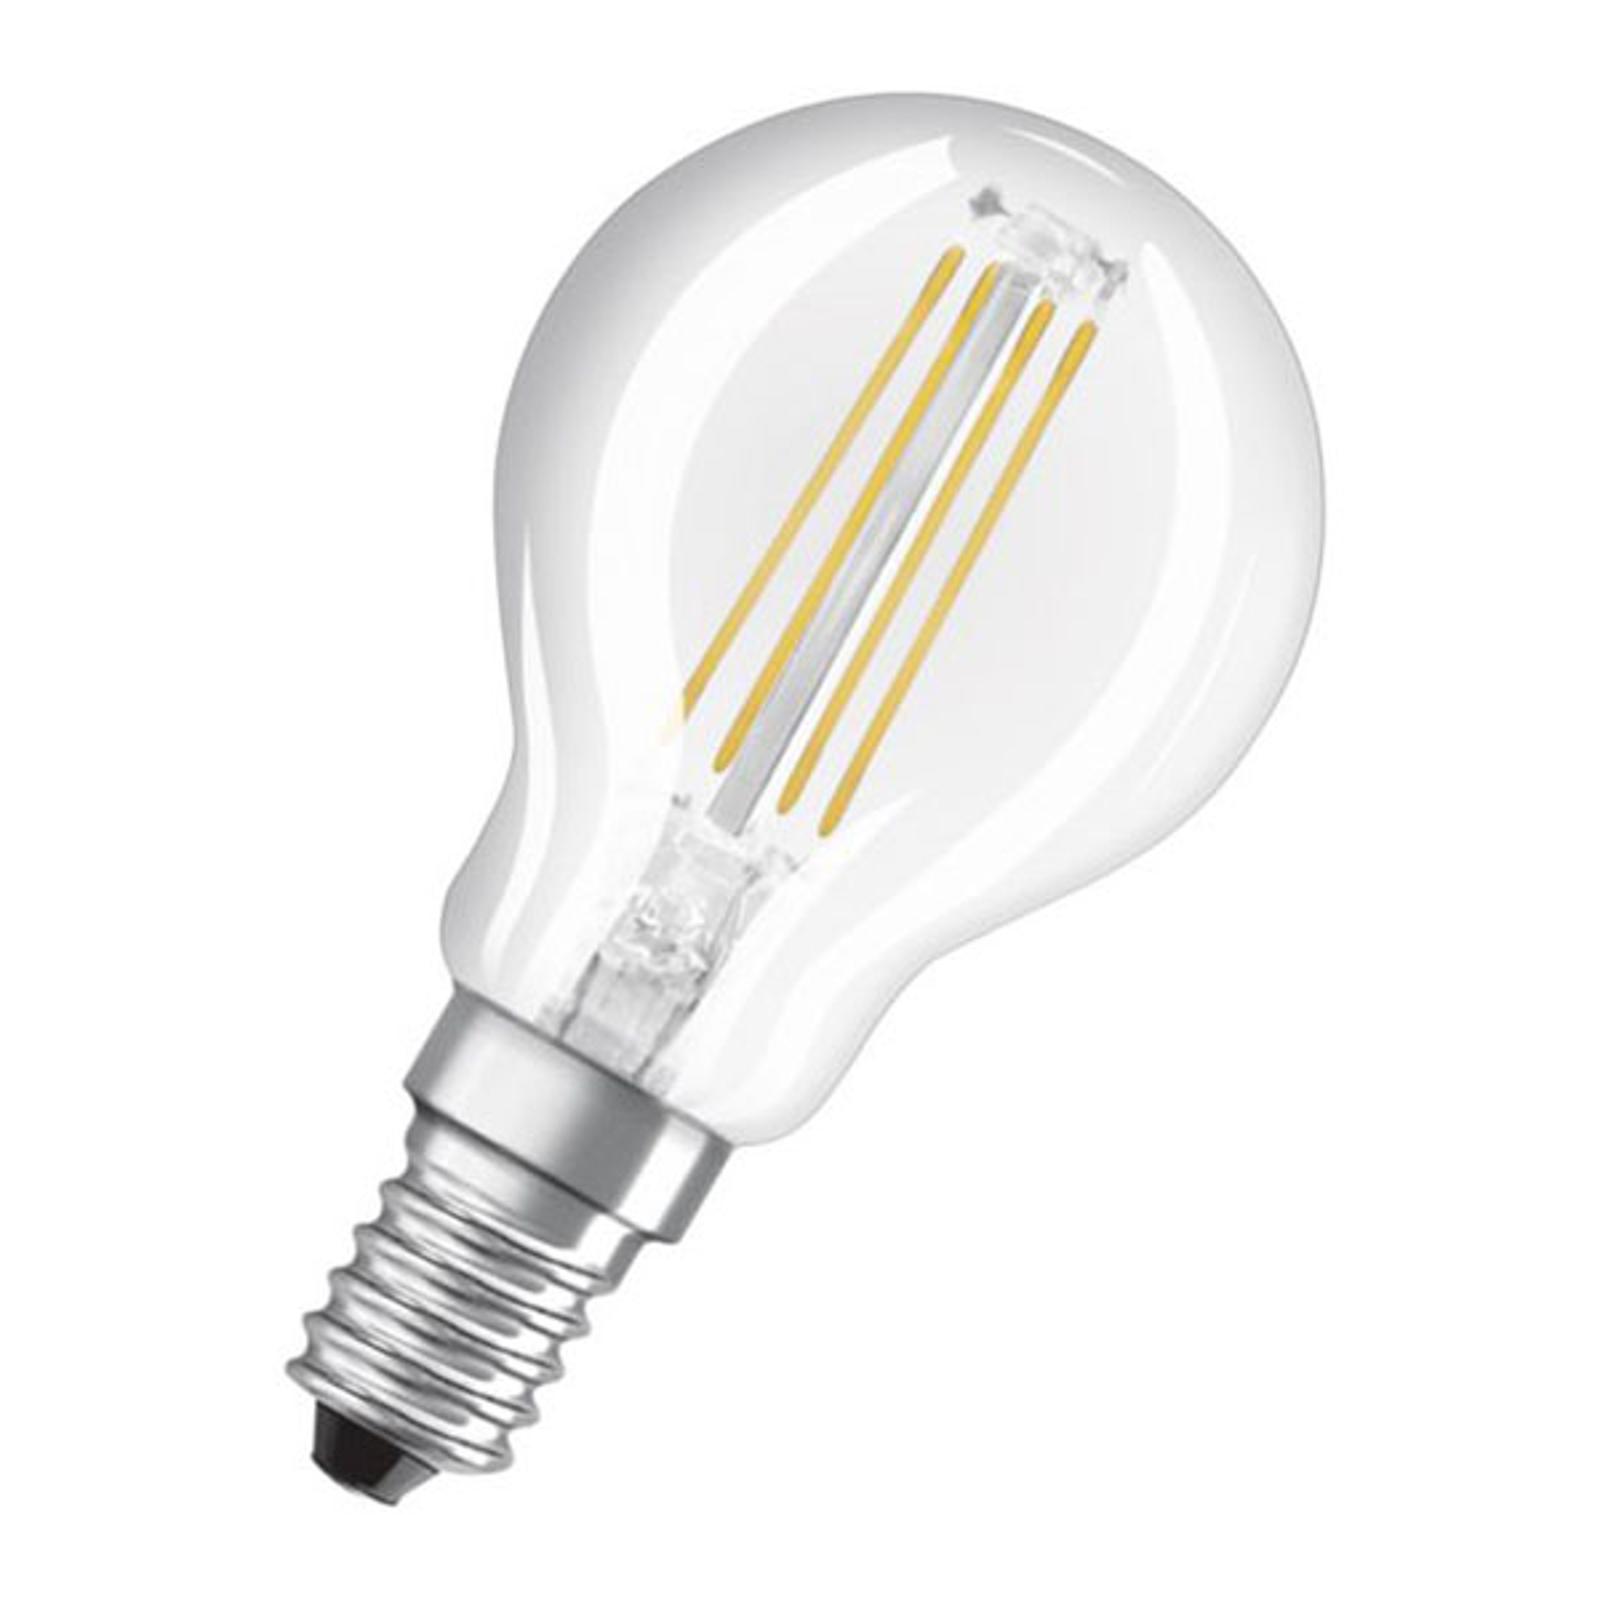 OSRAM Classic P 2 ampoules LED E14 4W 2700K transp